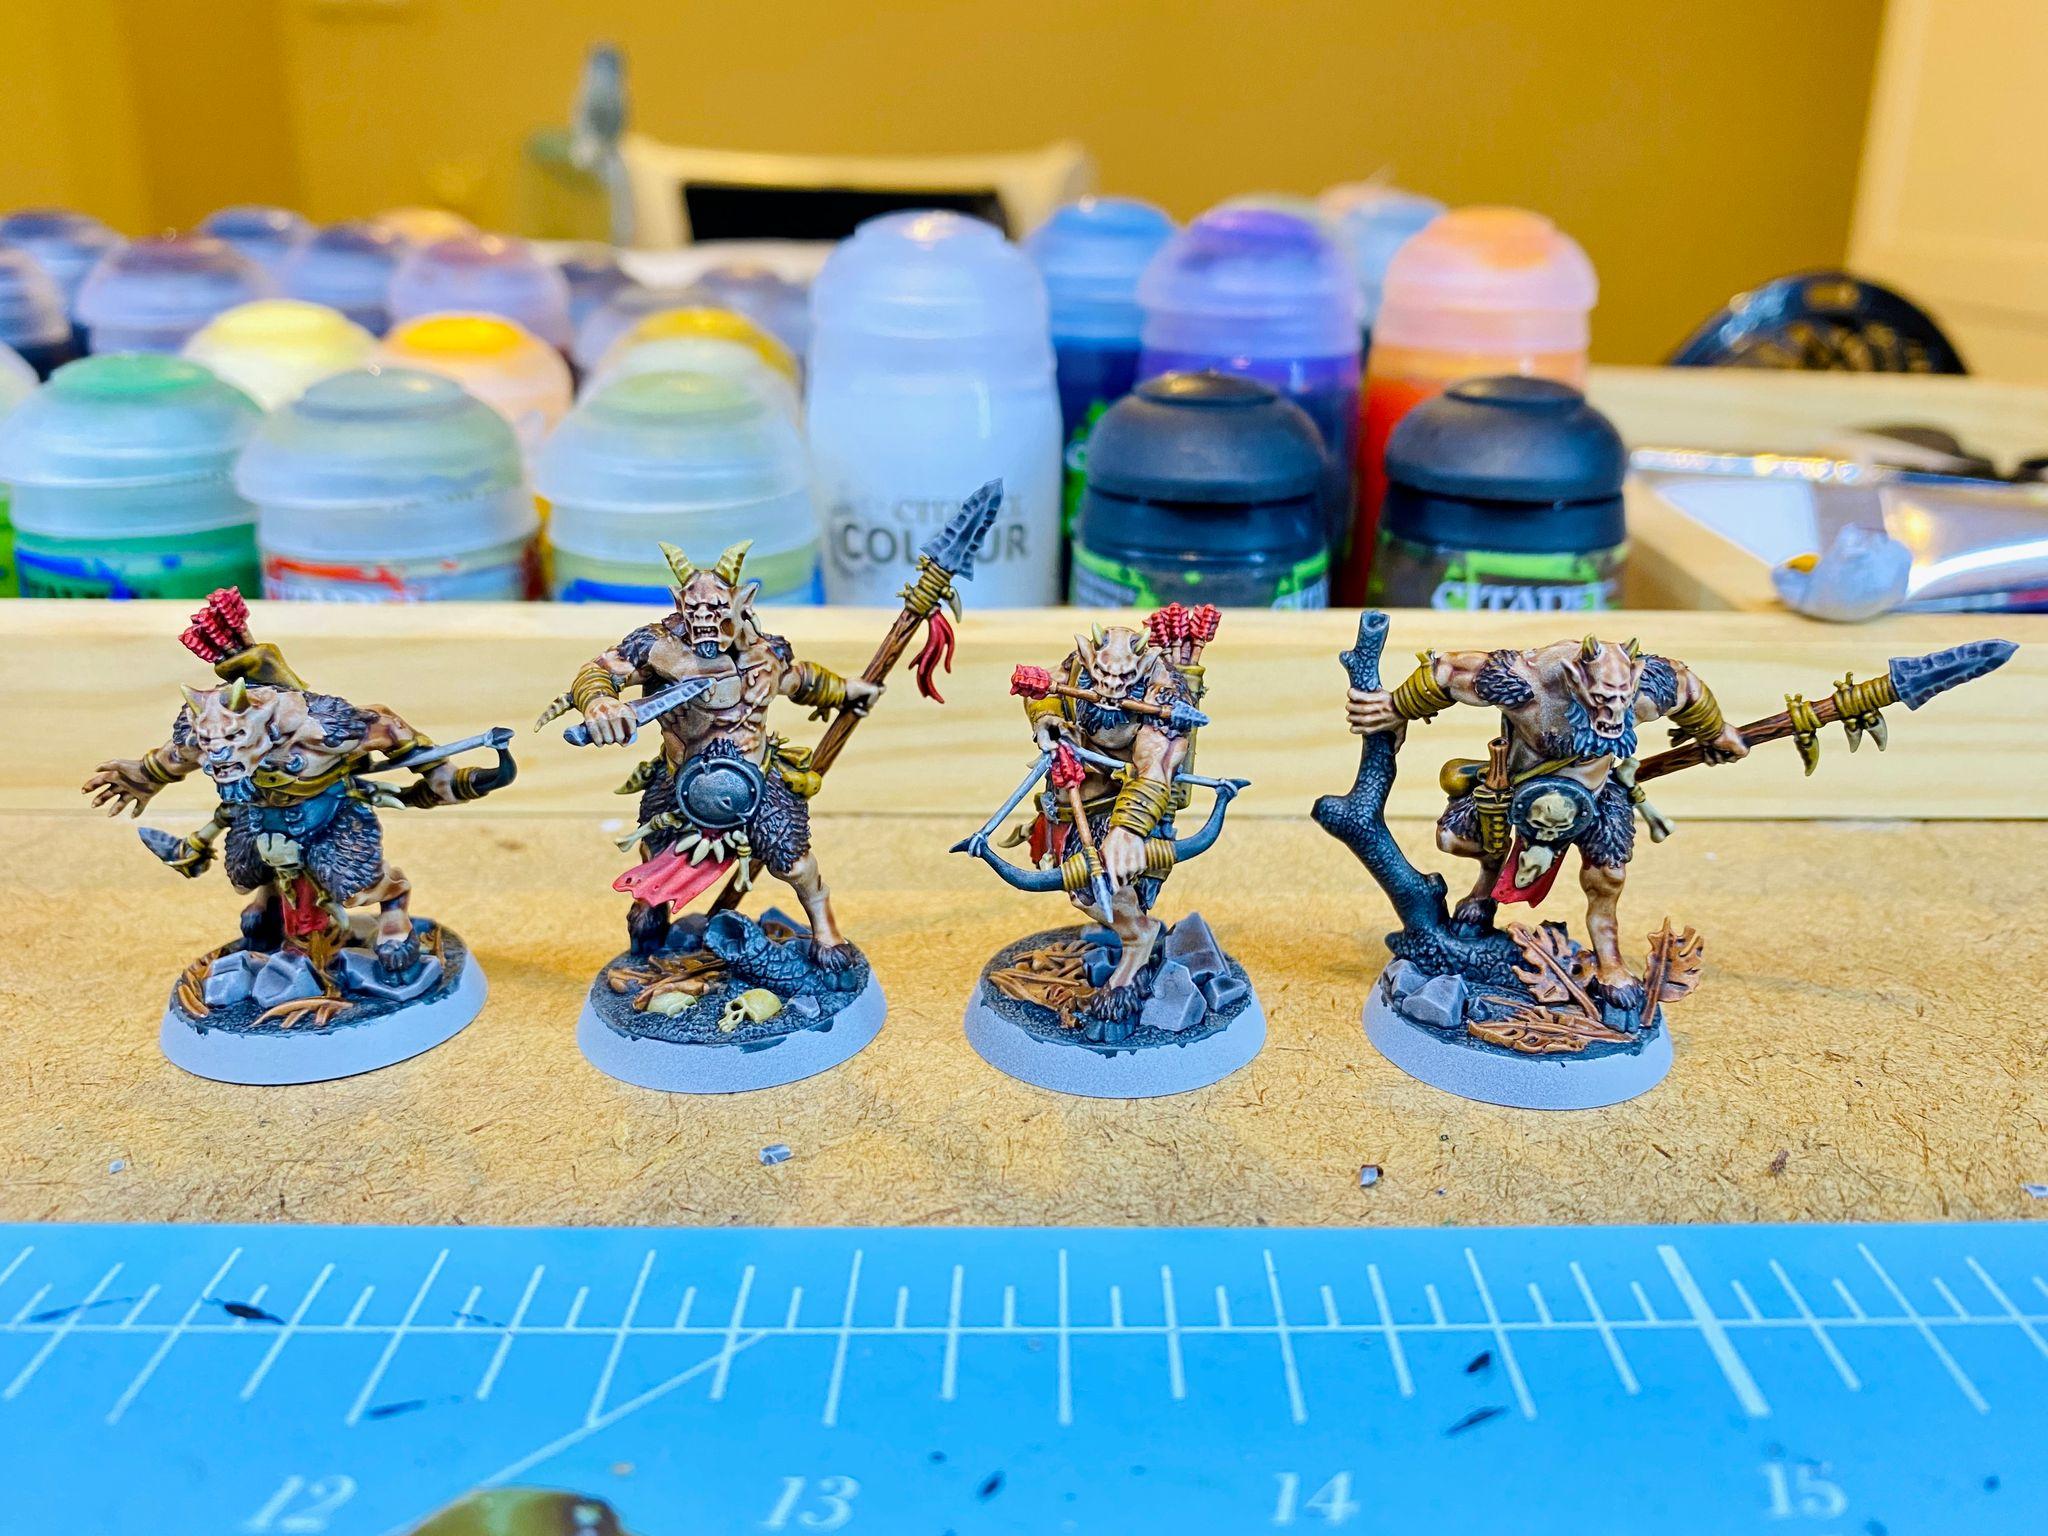 A photo of four goatmen miniatures from Games Workshop's Warhammer Underworlds: Beastgrave brandishing weapons.